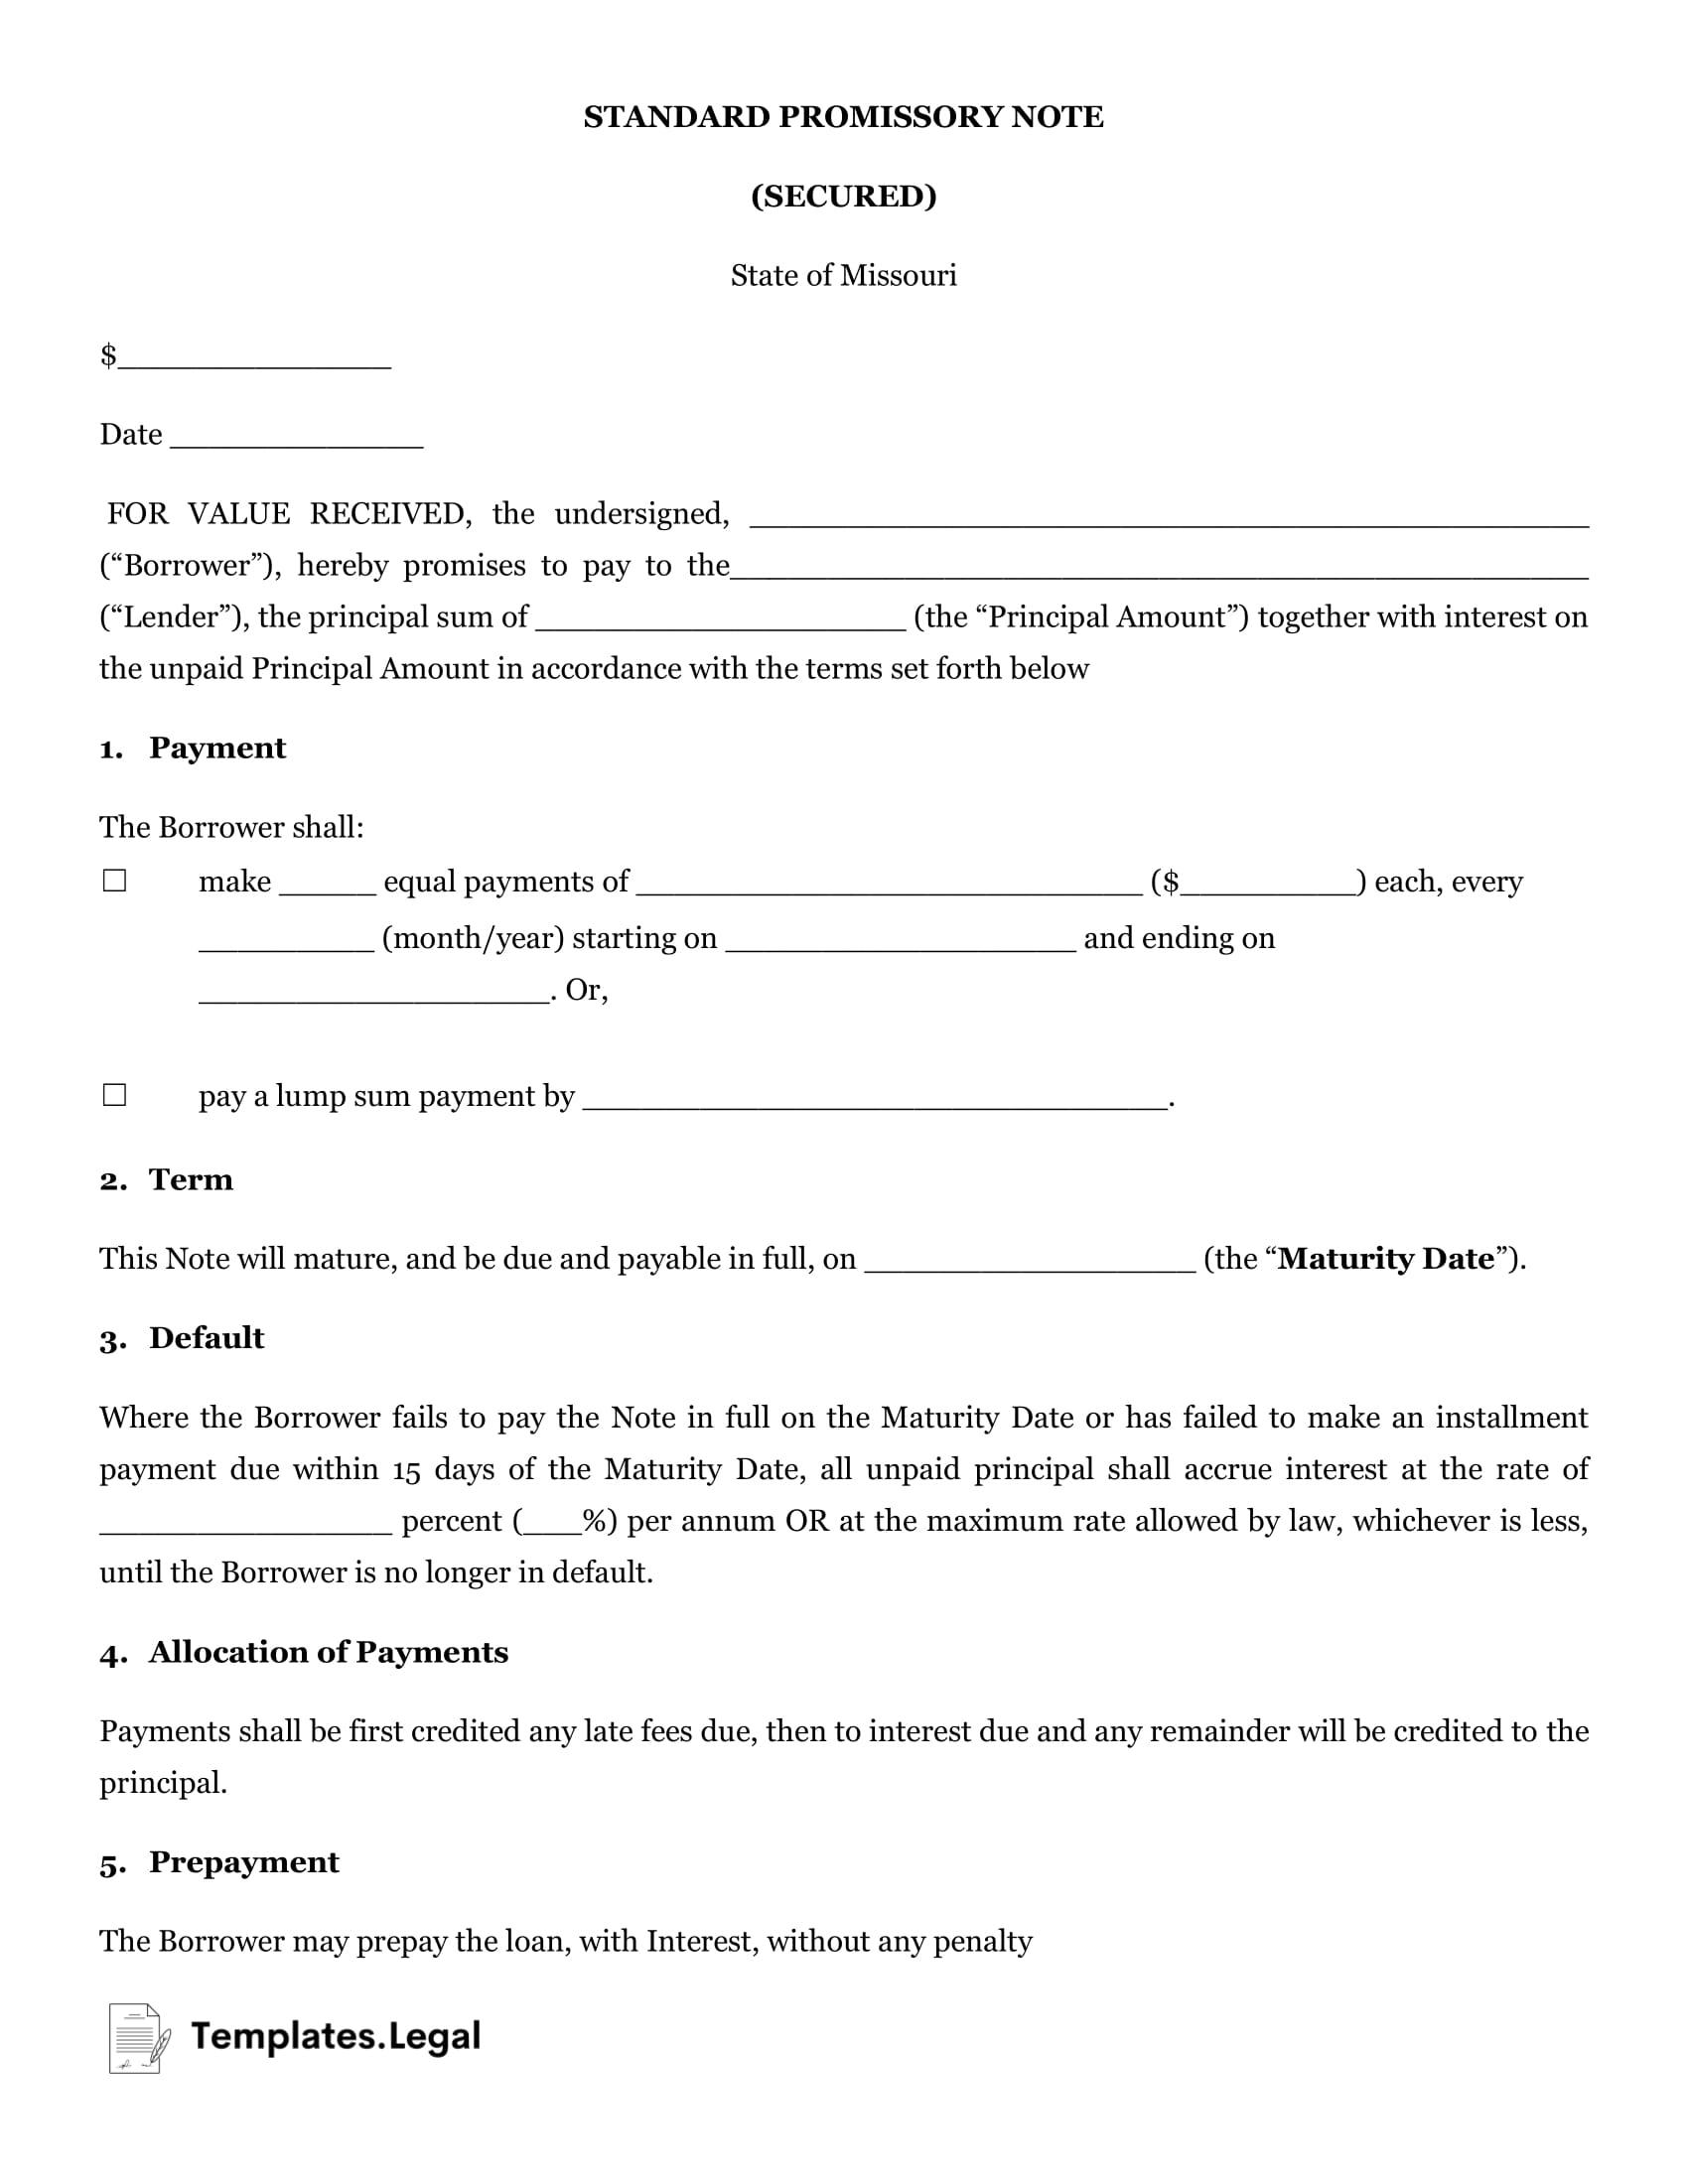 Missouri Secured Promissory Note - Templates.Legal